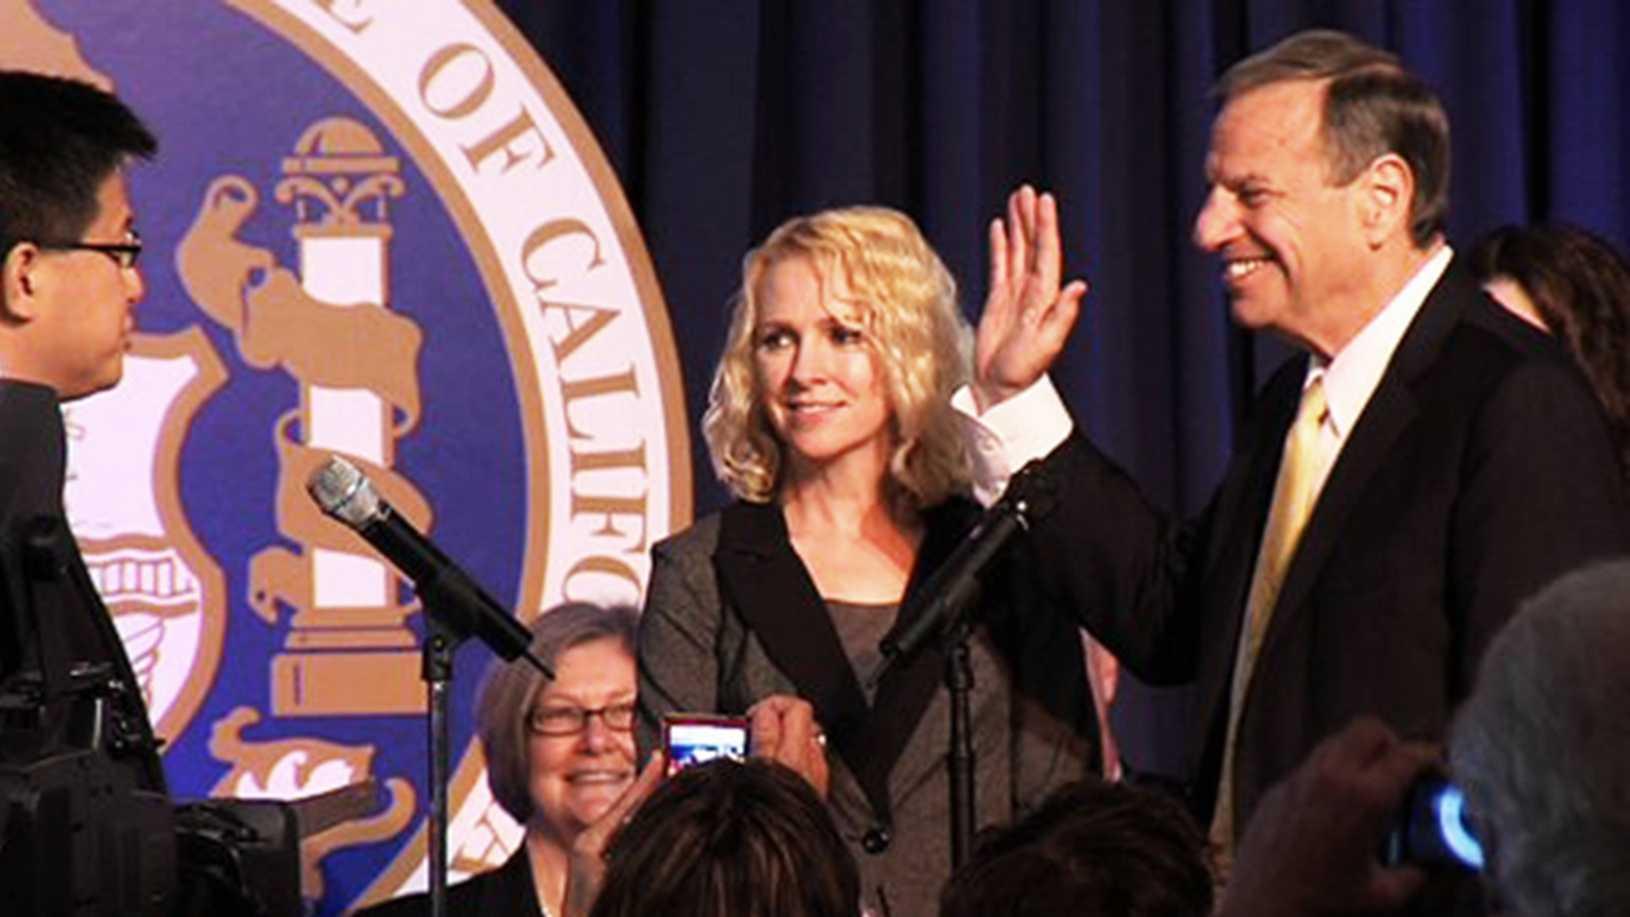 This is San Diego Mayor Bob Filner being sworn in as mayor with his then-fiance Bronwyn Ingramsmiling next to him.